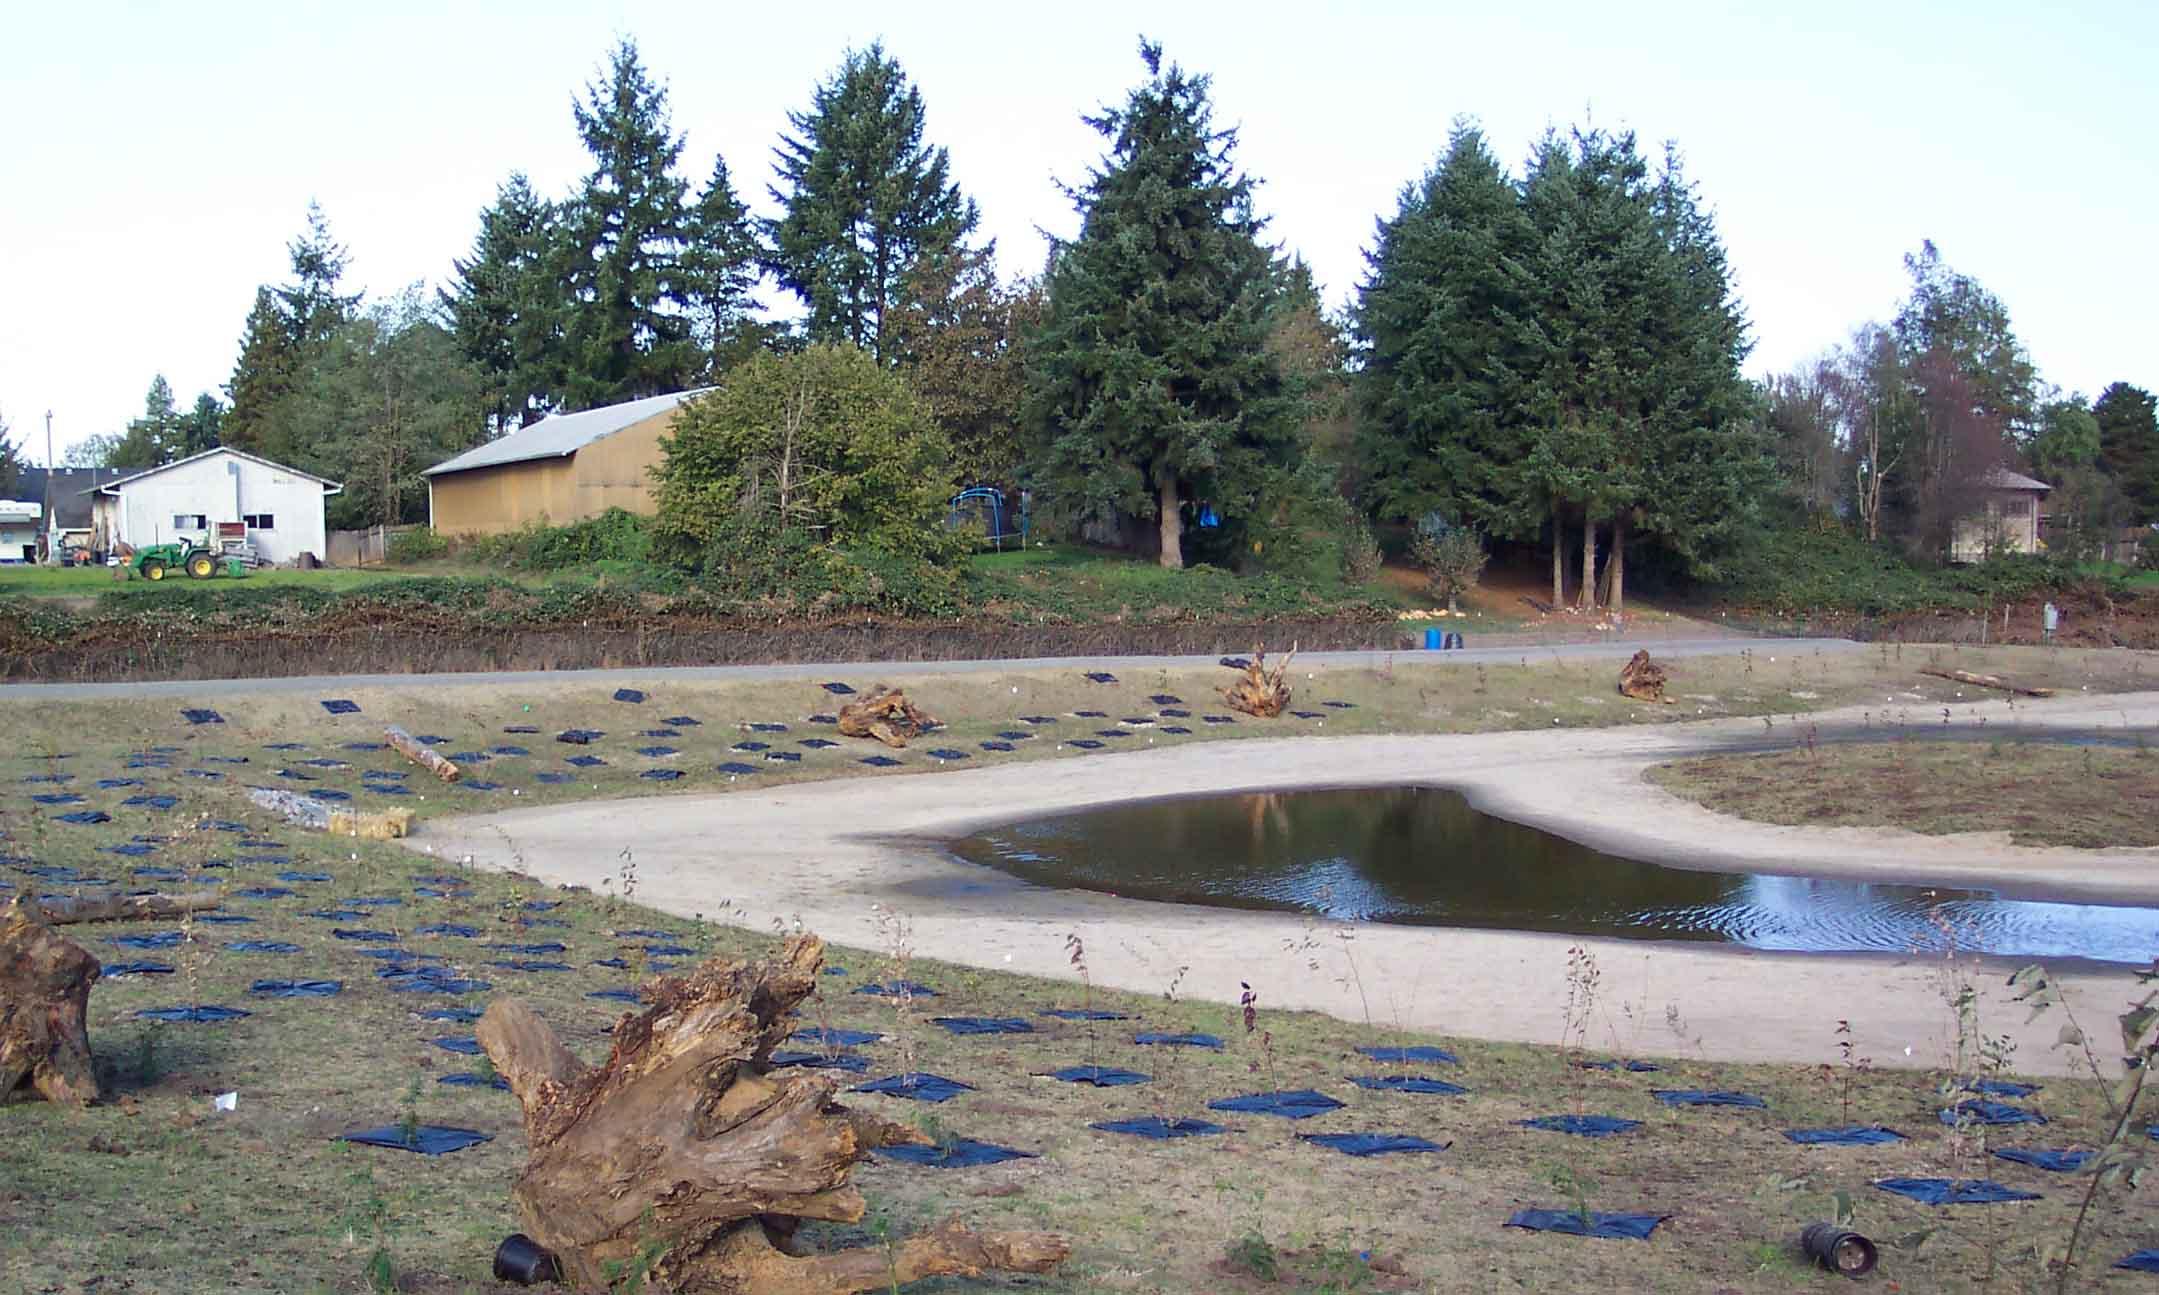 Thomas wetland, Clark County